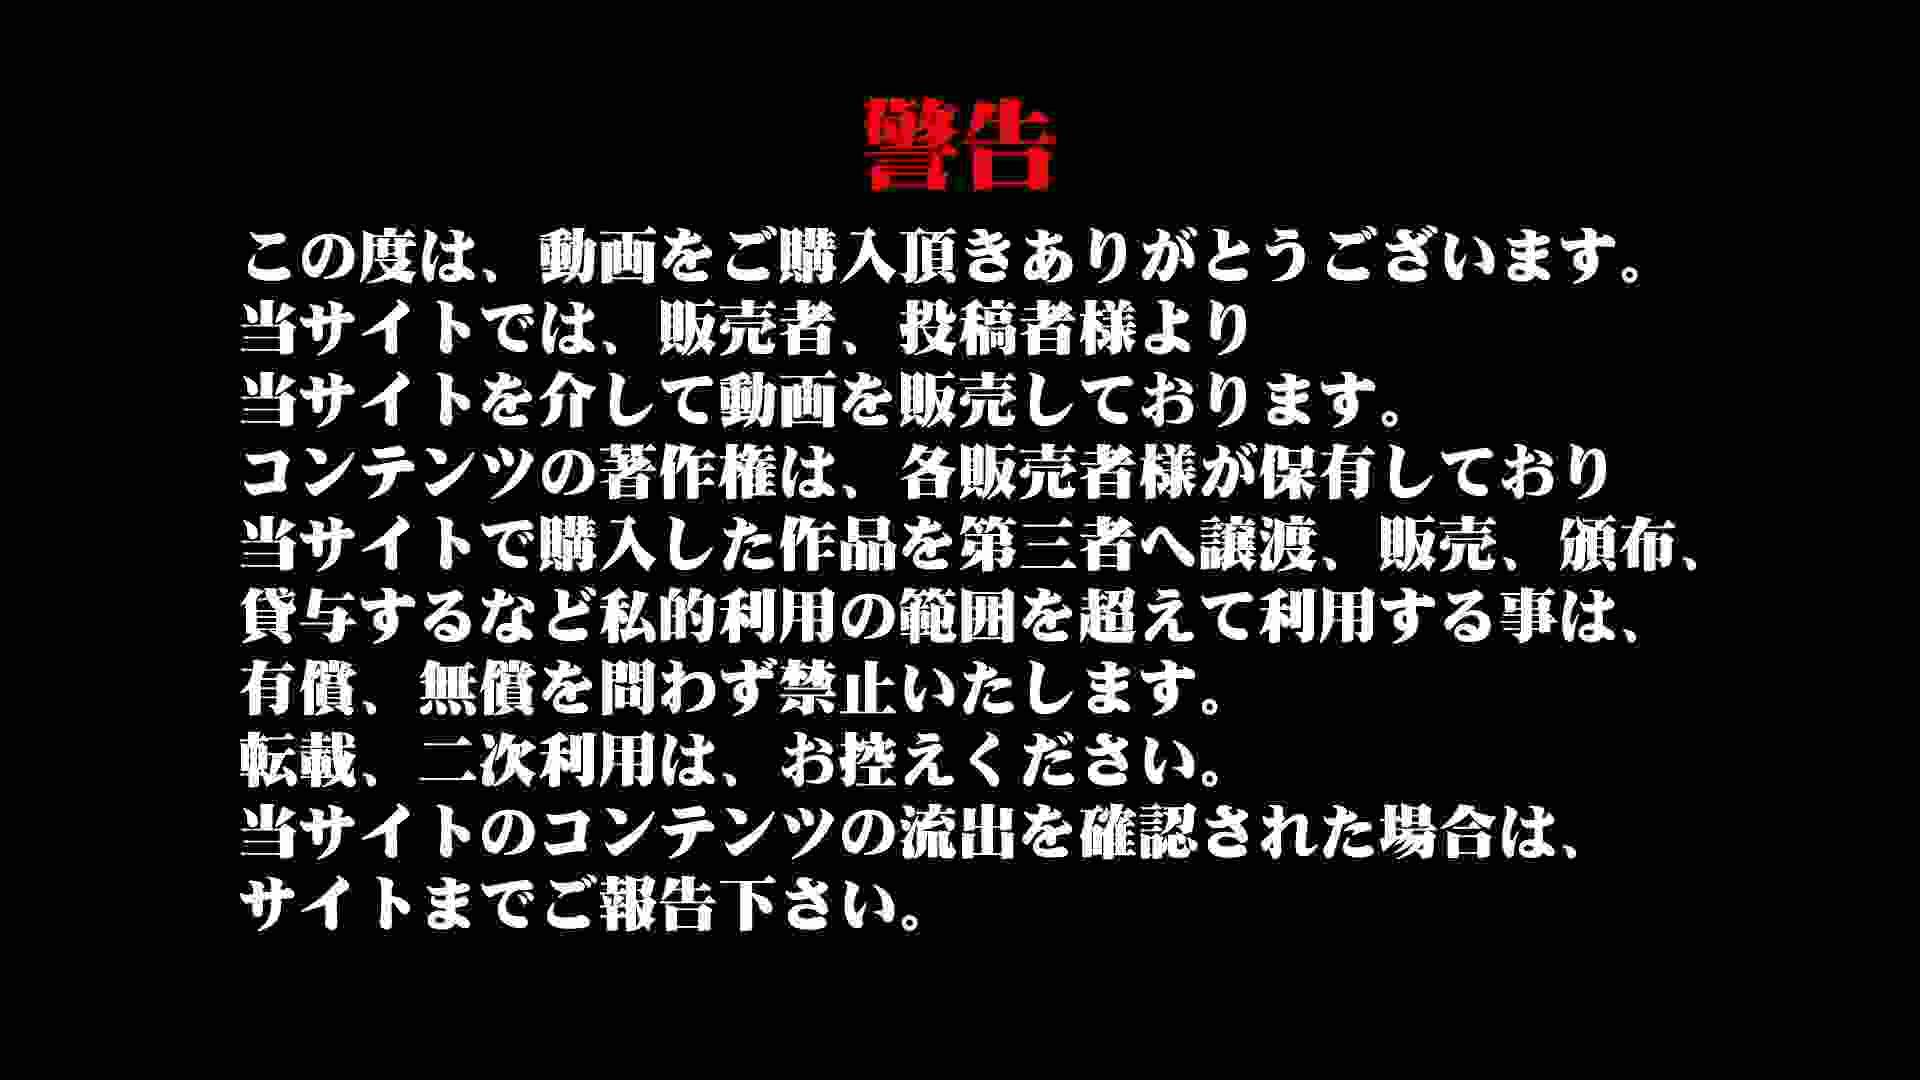 Aquaな露天風呂Vol.915 OLすけべ画像 オマンコ動画キャプチャ 99連発 2